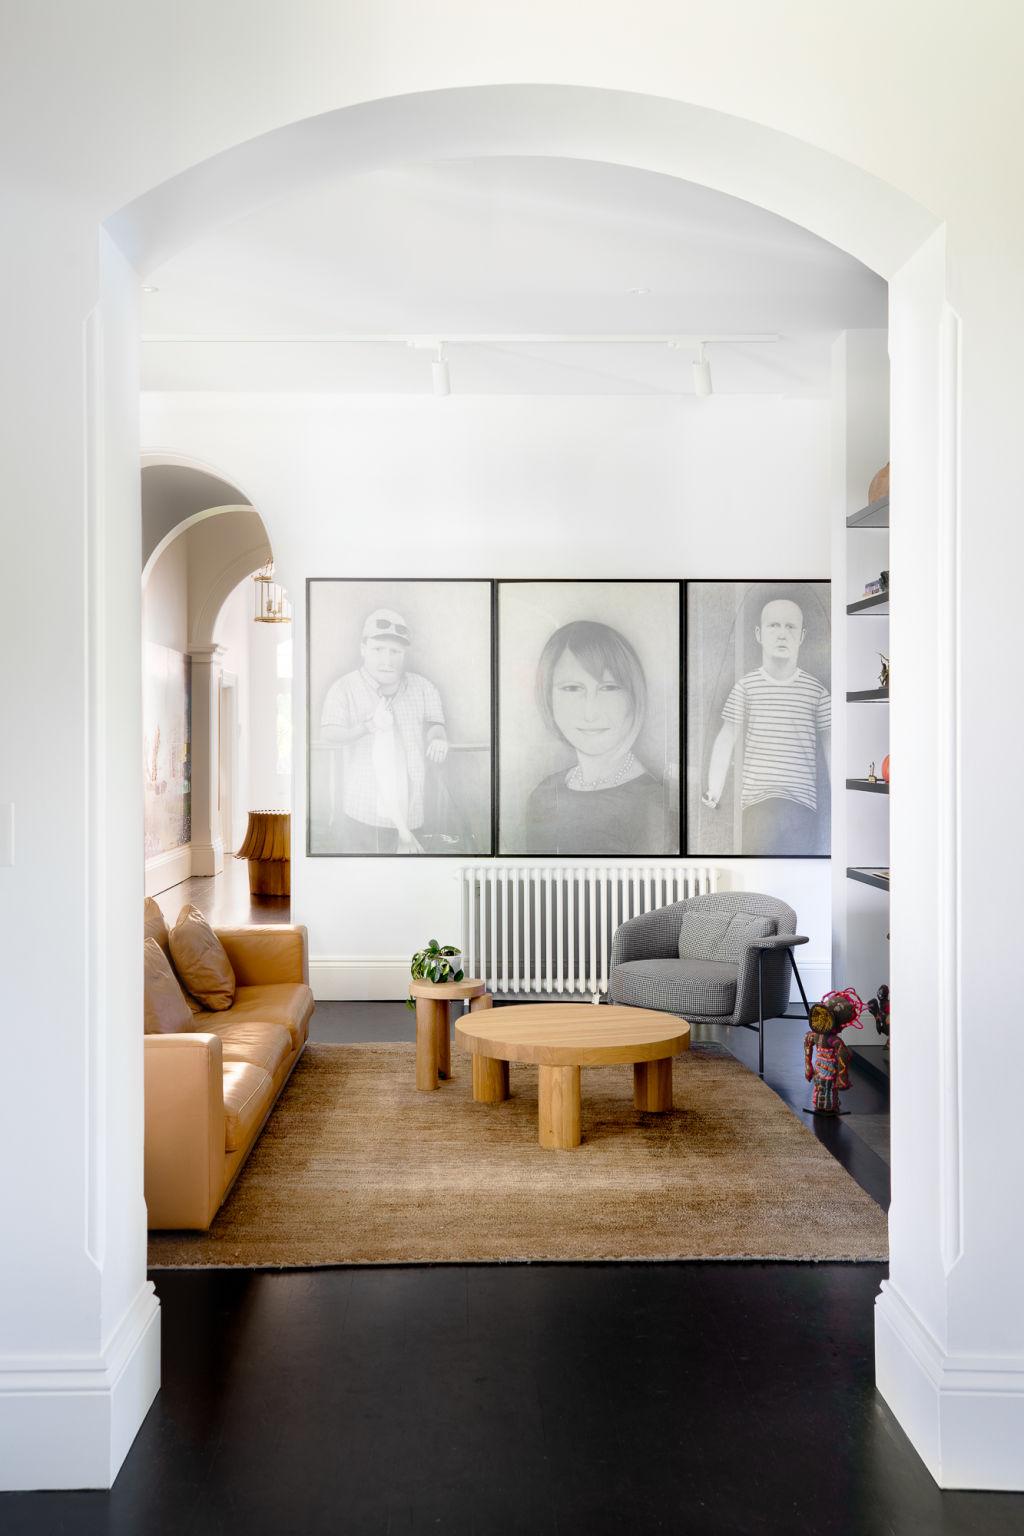 Kensington-Park-House-Williams-Burton-Leopardi-Yellowtrace-04_eanpf7